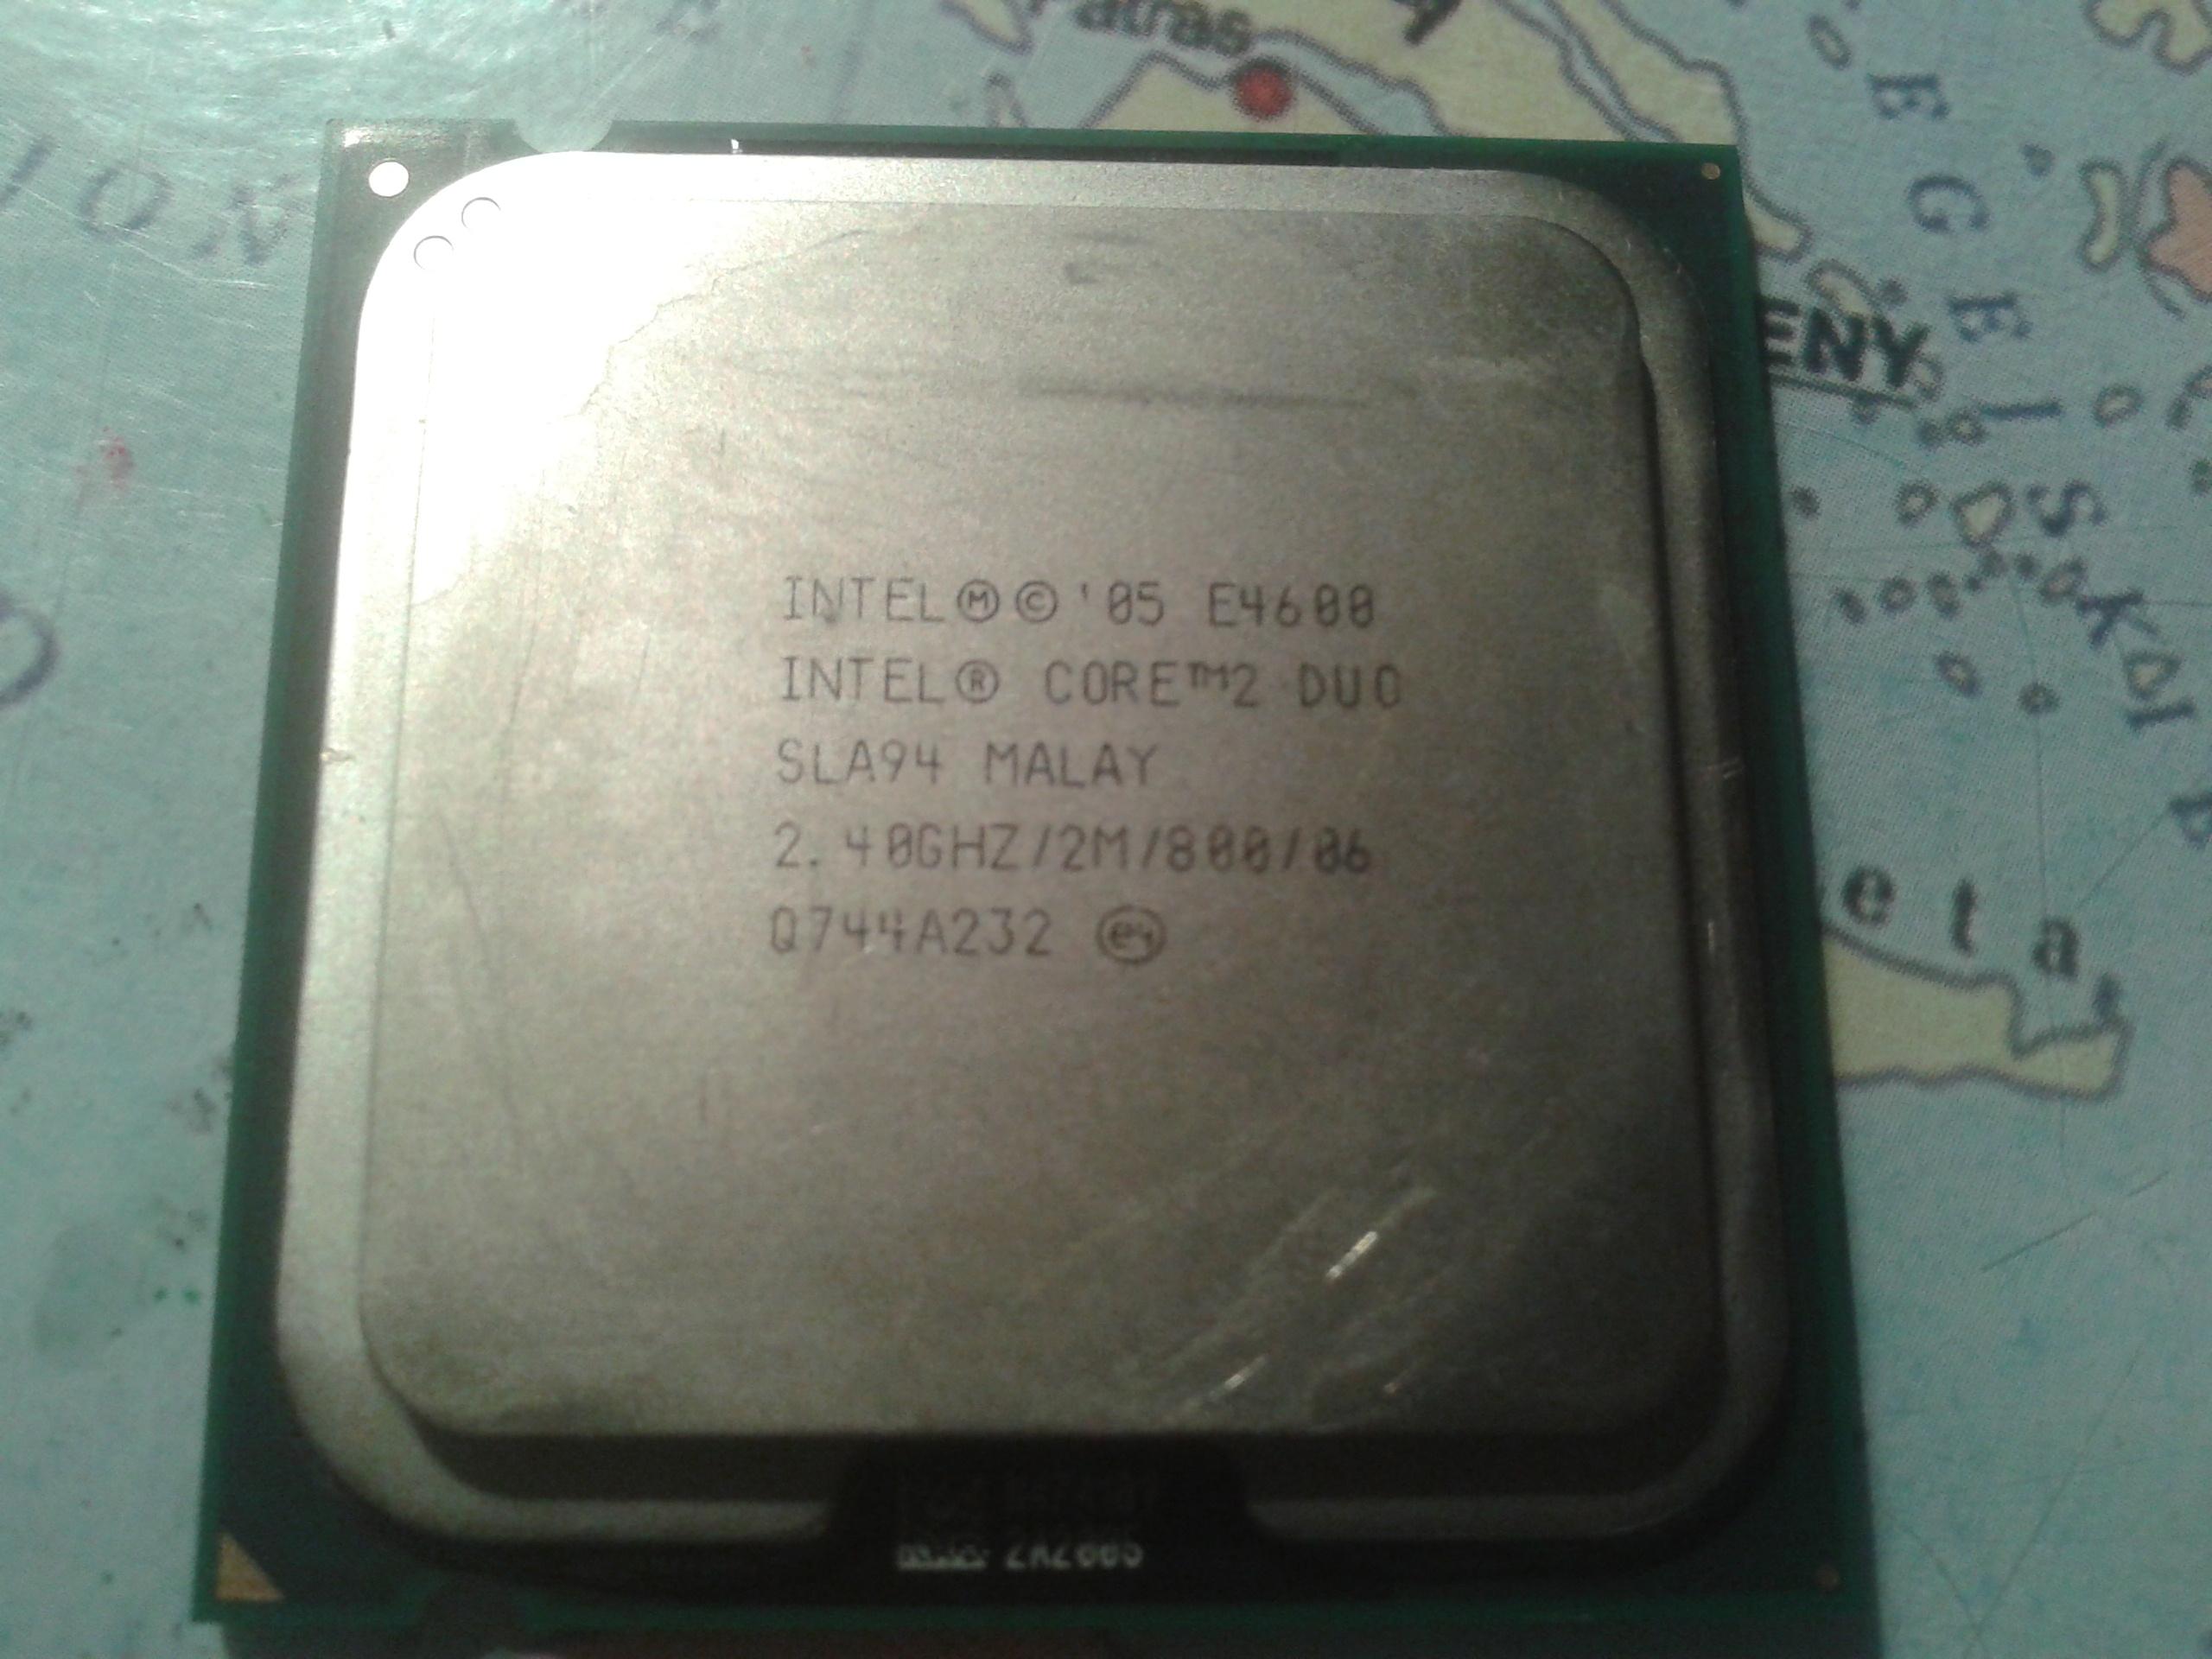 [Sprzedam] Procesor Intel Core 2 Duo E4600 2,4 Ghz